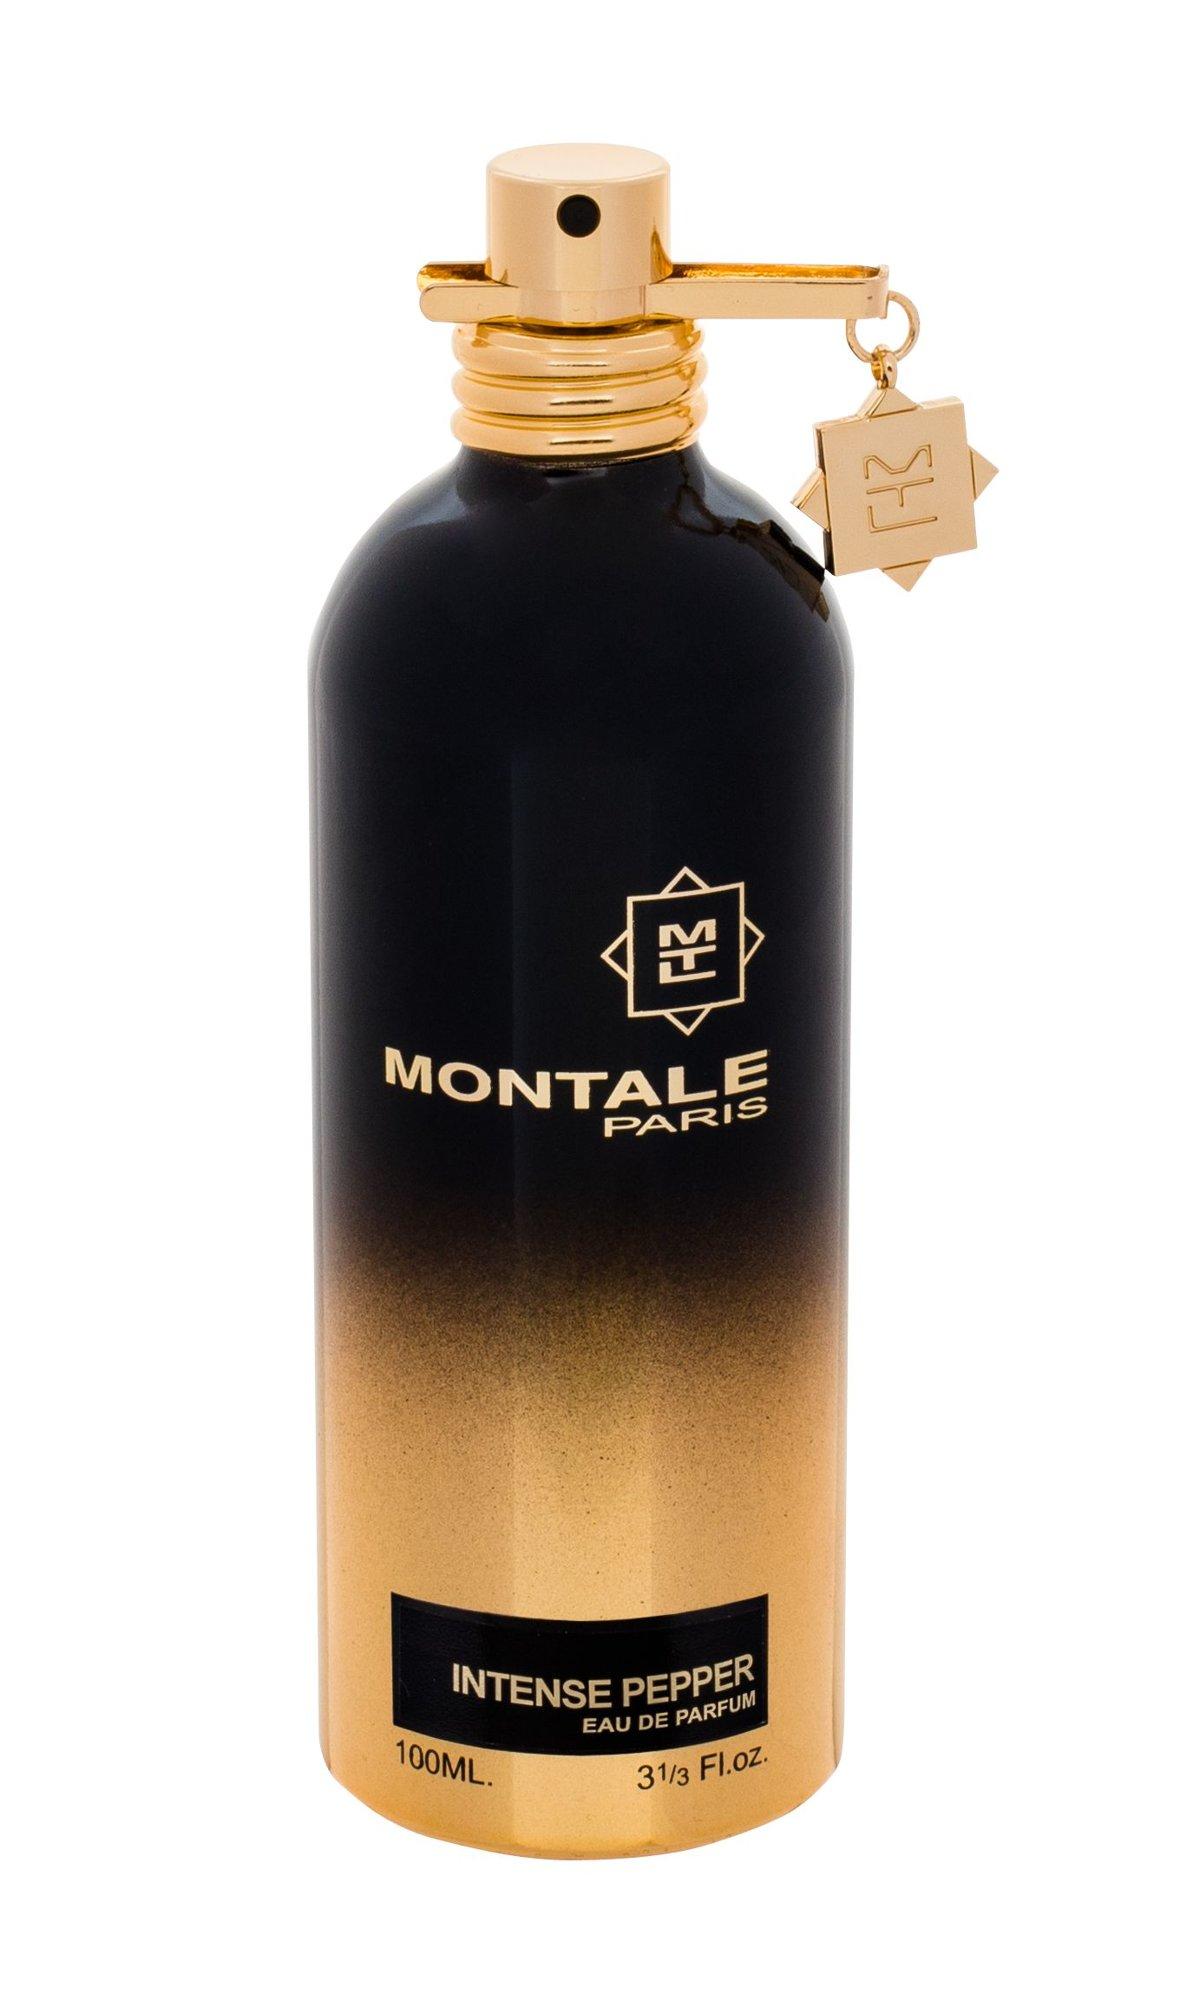 Montale Paris Intense Pepper EDP 100ml